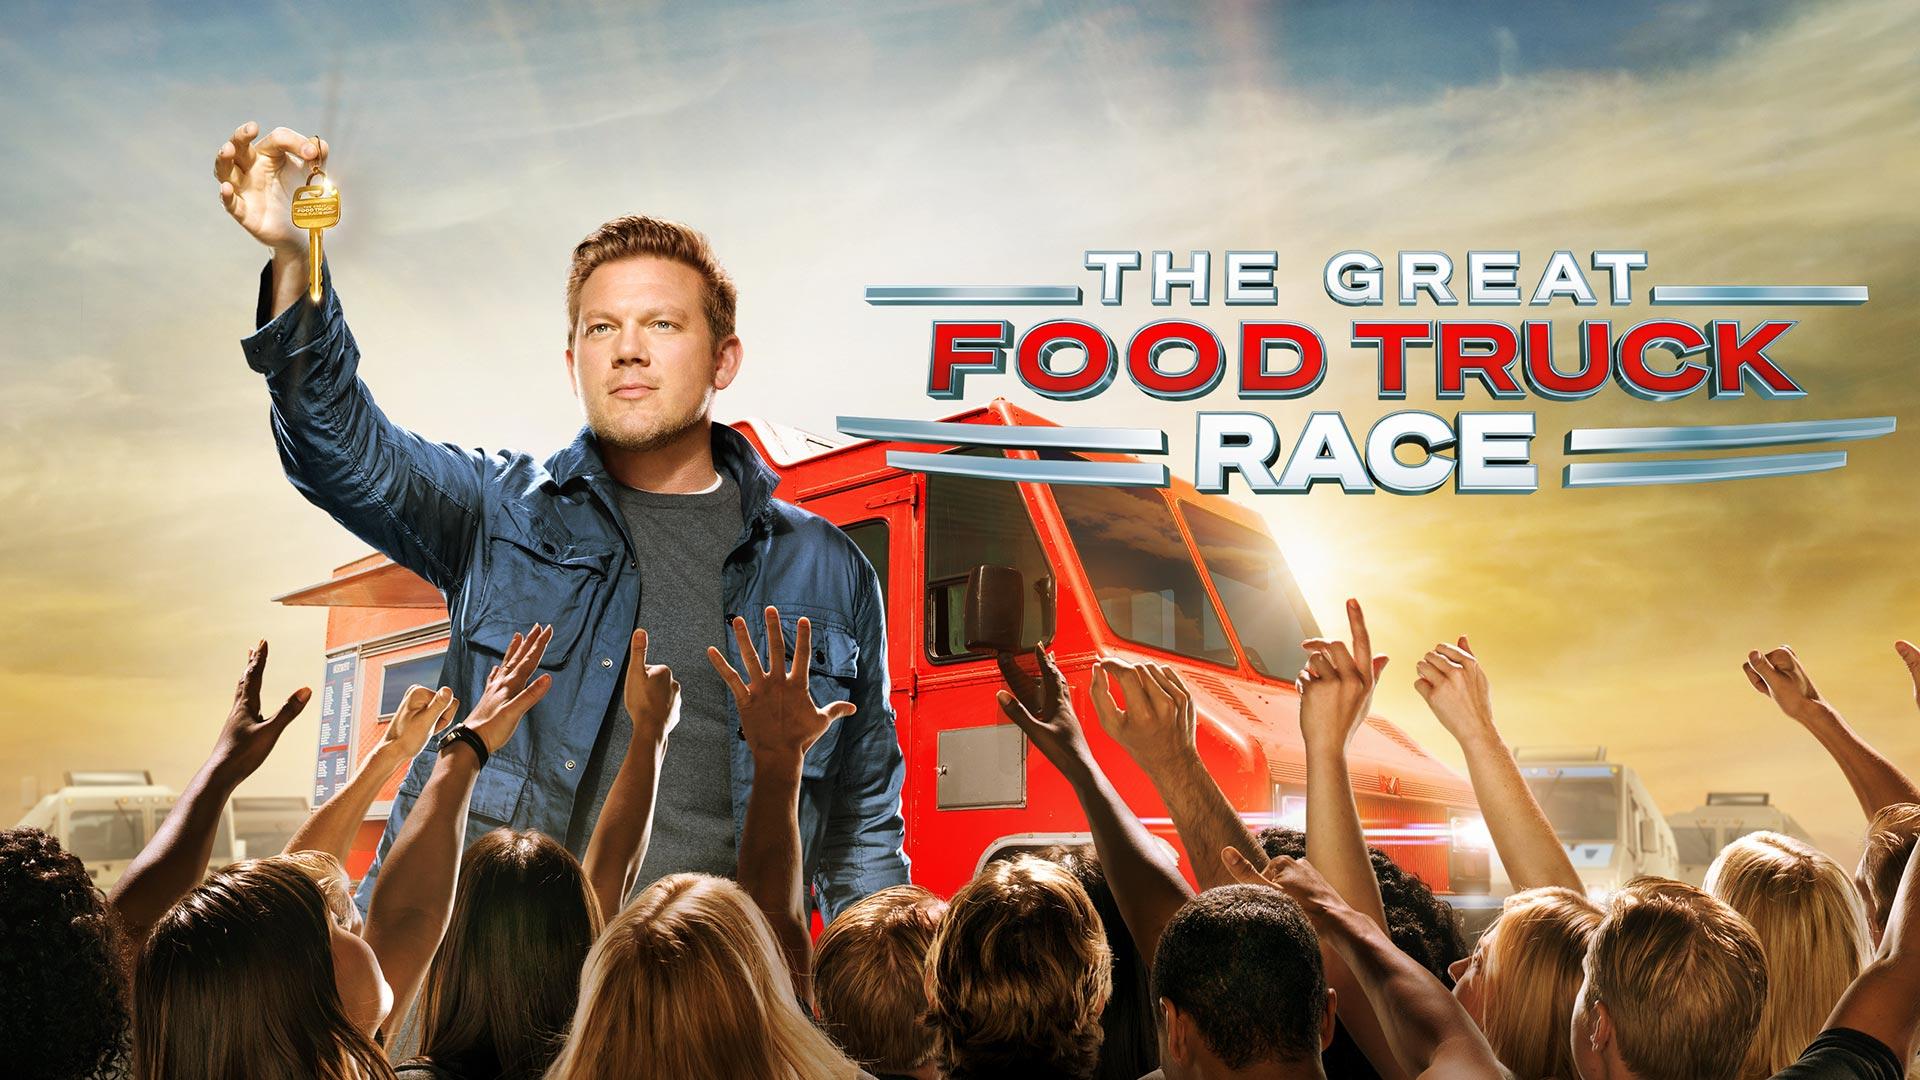 The Great Food Truck Race, Season 1